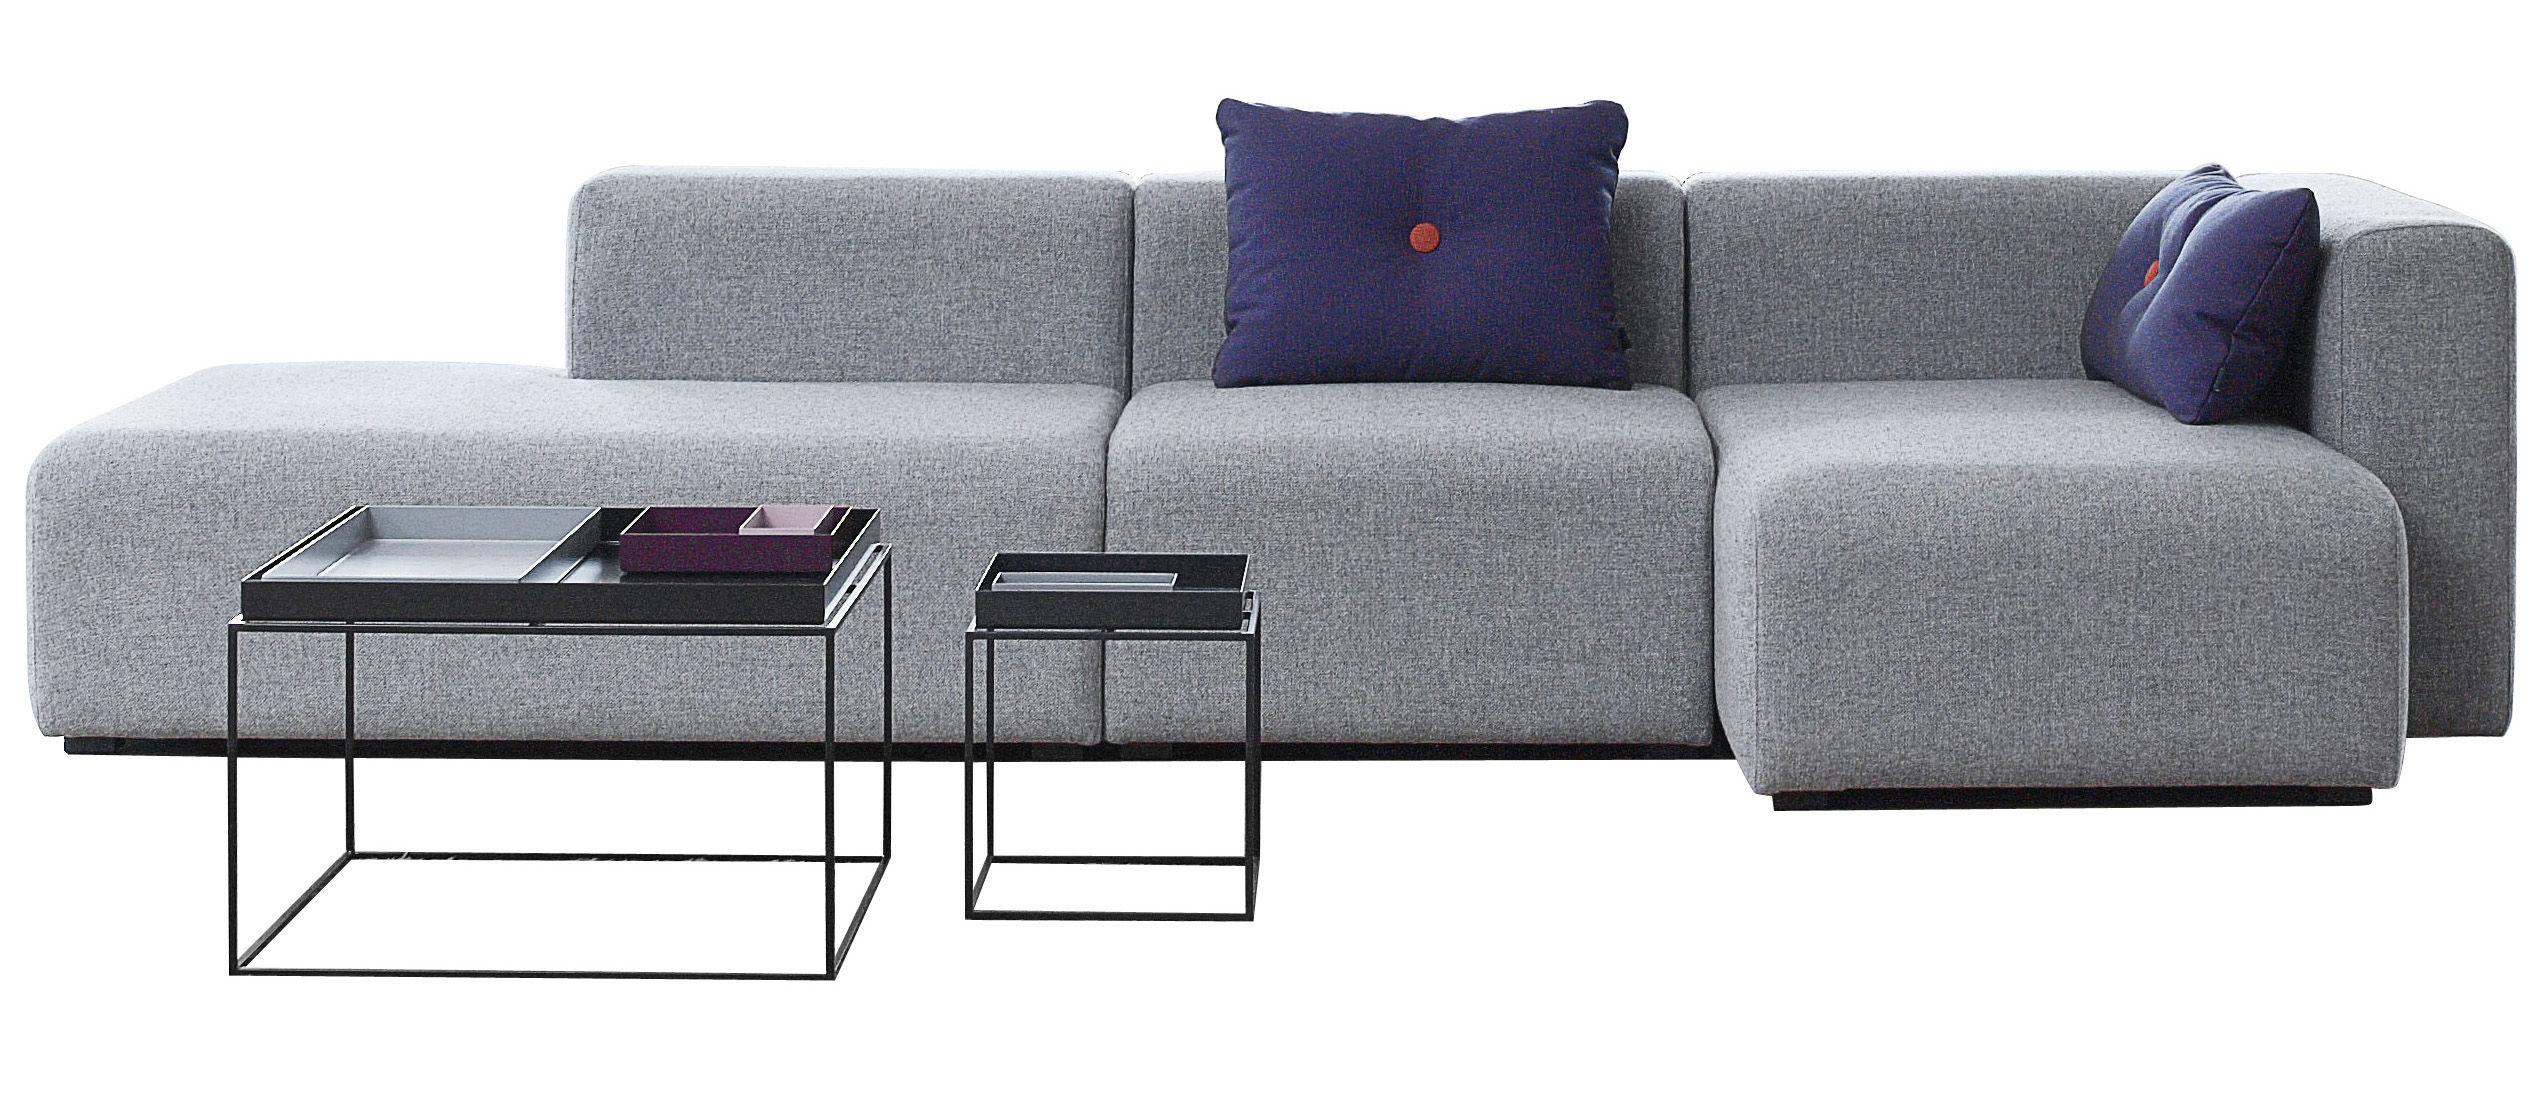 Möbel - Sofas - Mags Ecksofa L 302 cm - Armlehne links - Hay - Hellgrau - Armlehne links - Gewebe